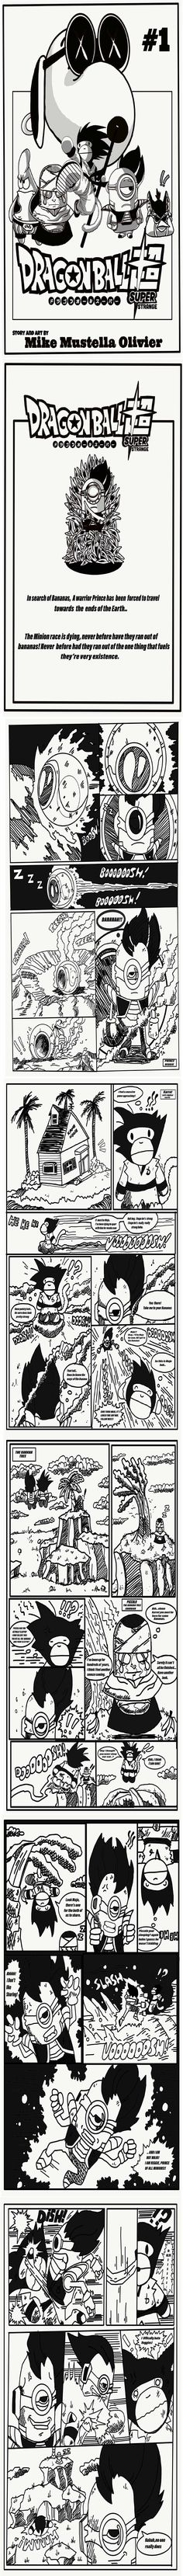 On Drangonball-Super Strange  #mikeyjdotarts_on_facebook #mikeyjdotcom #daily__art #daily_sketch #art🎨 #artworks #lustrator #dopeshit #trillshit #blade #knifeporno #kitana #erronblack #conceptual #sketch #visualart #blackswagger #charactersketch #swordartonline #swordart #manga #skaterfashion #characterdesign #anime #grapic #inkmaster #blackswagger #artgallery #artcollection #kitana #drangonballz #vegeta Ink Master, Art Daily, Skater Style, Sketch Art, Sword Art Online, Blade, Artworks, Character Design, Art Gallery